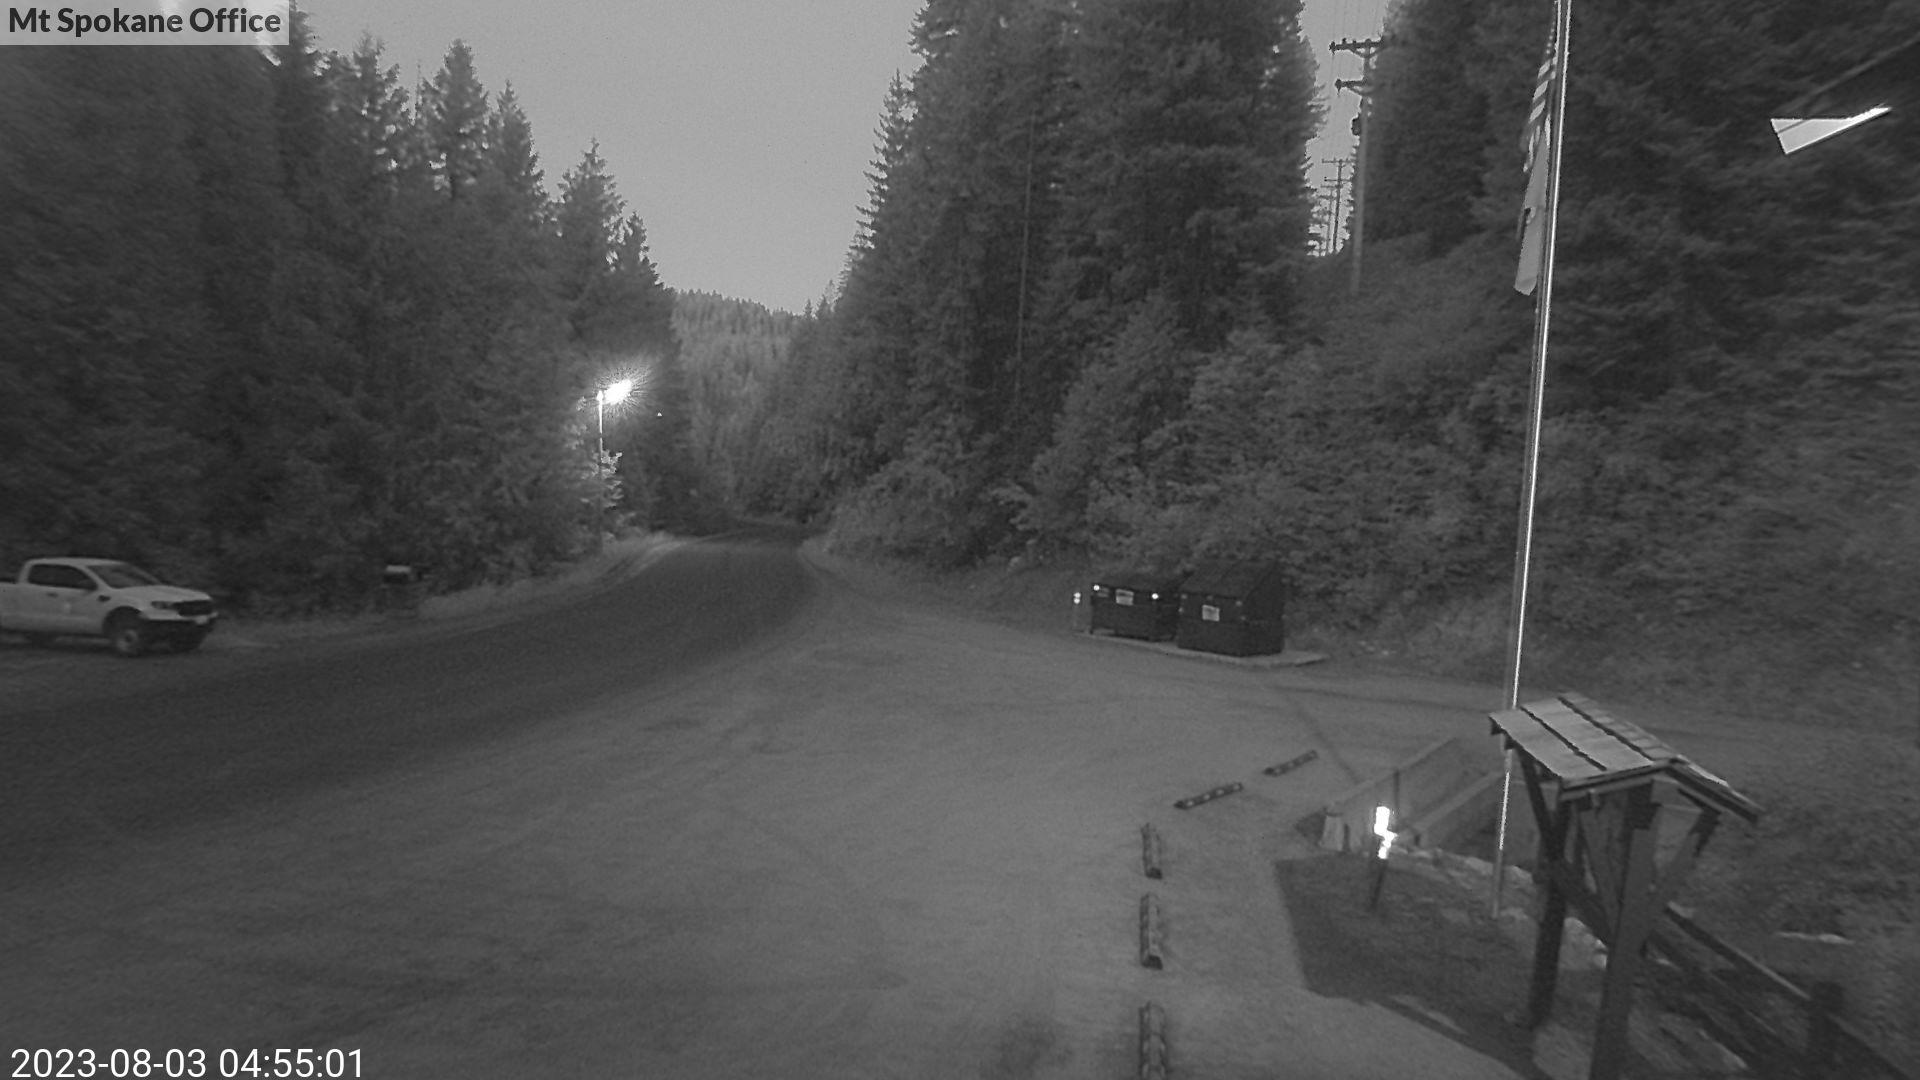 Web camera at Mount Spokane